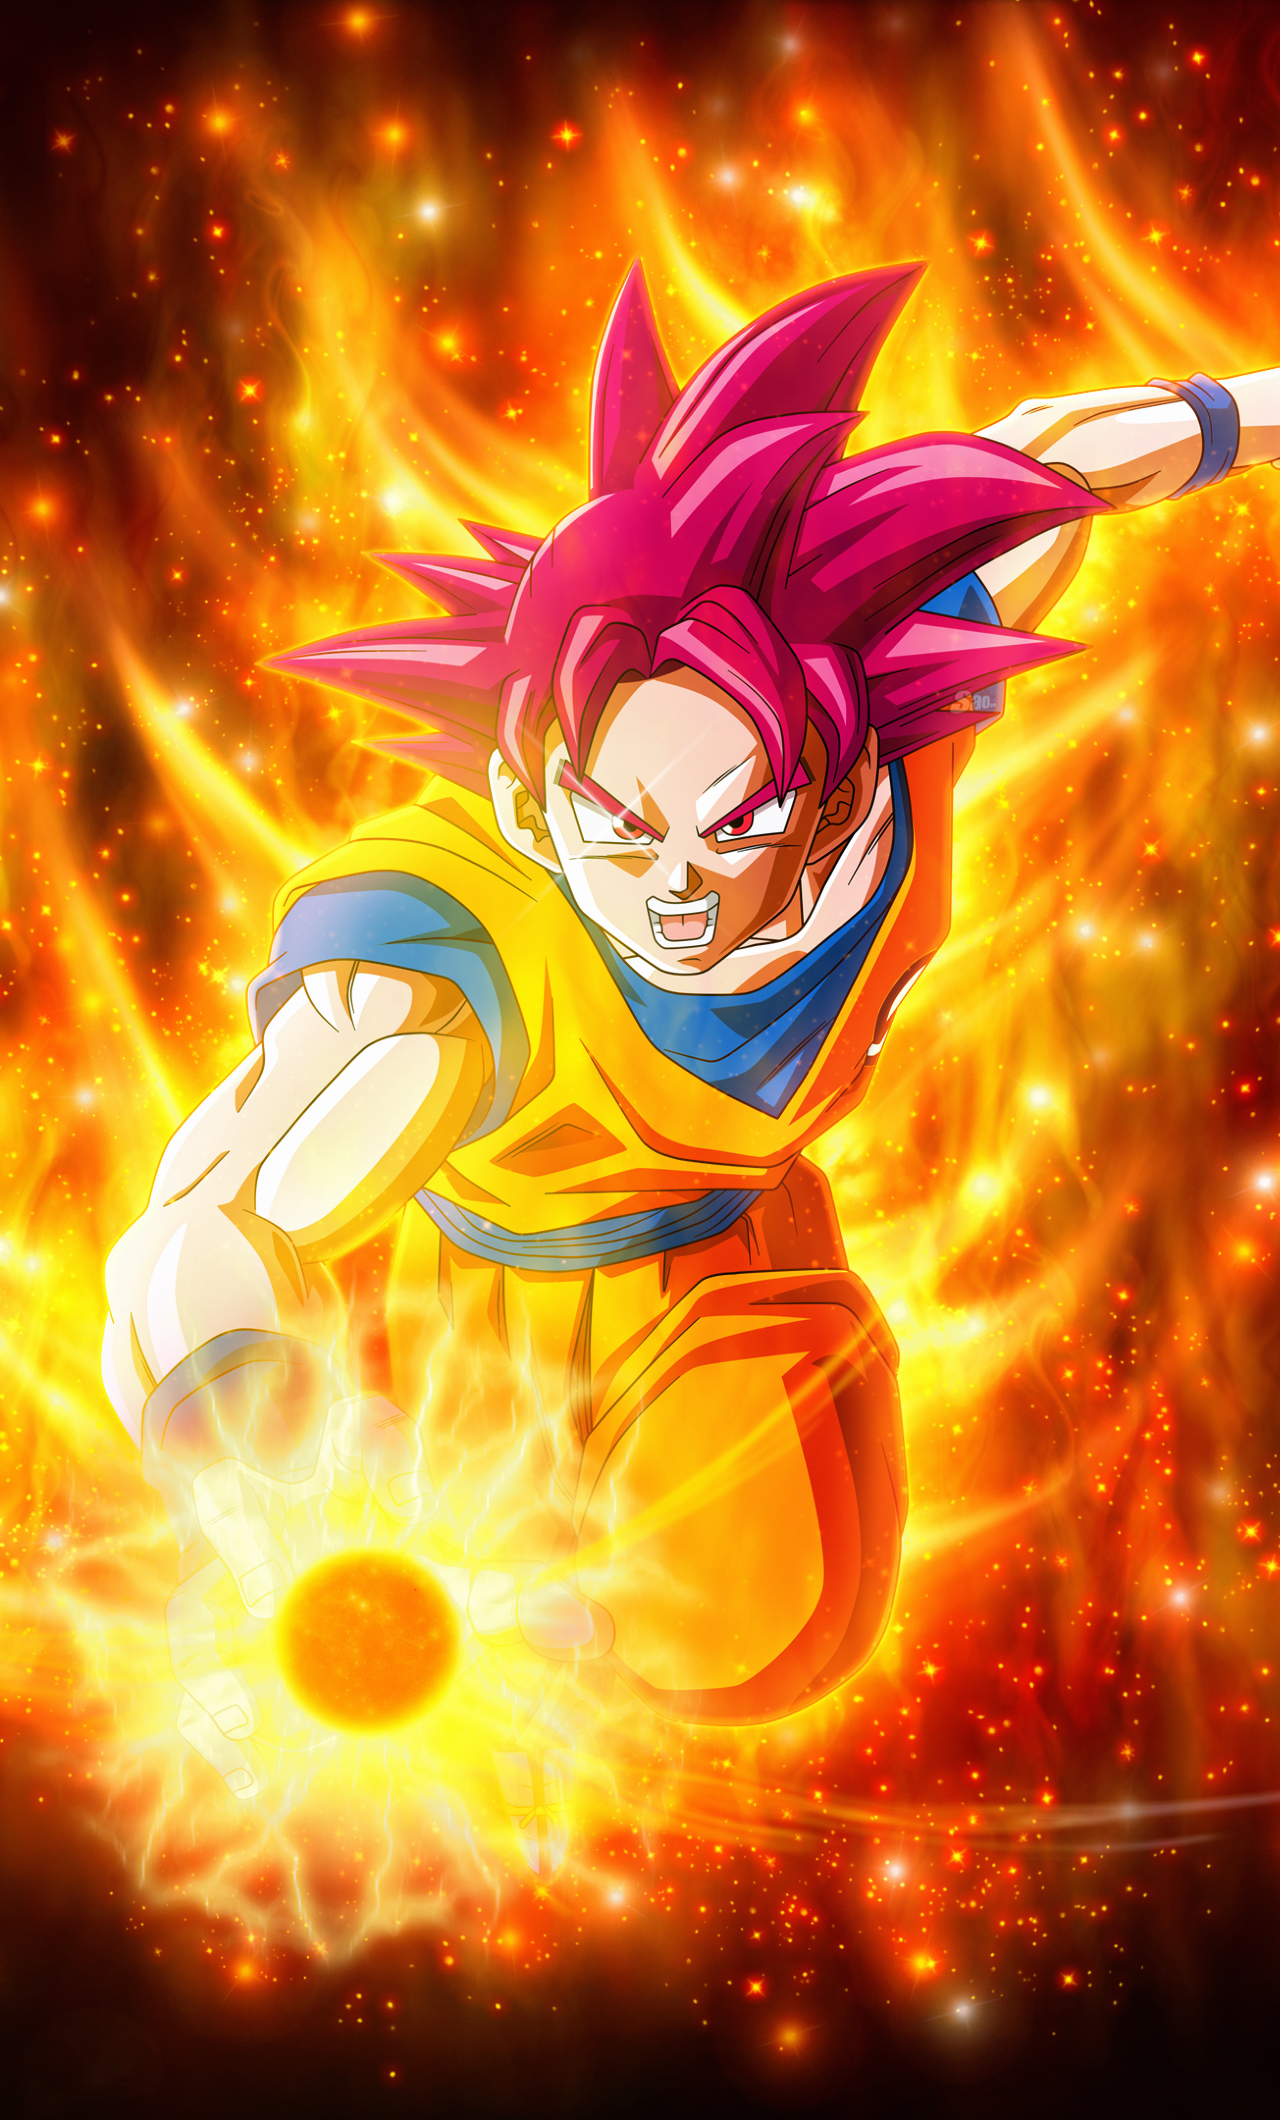 Super Saiyan God Goku Dragon Ball, HD 4K Wallpaper